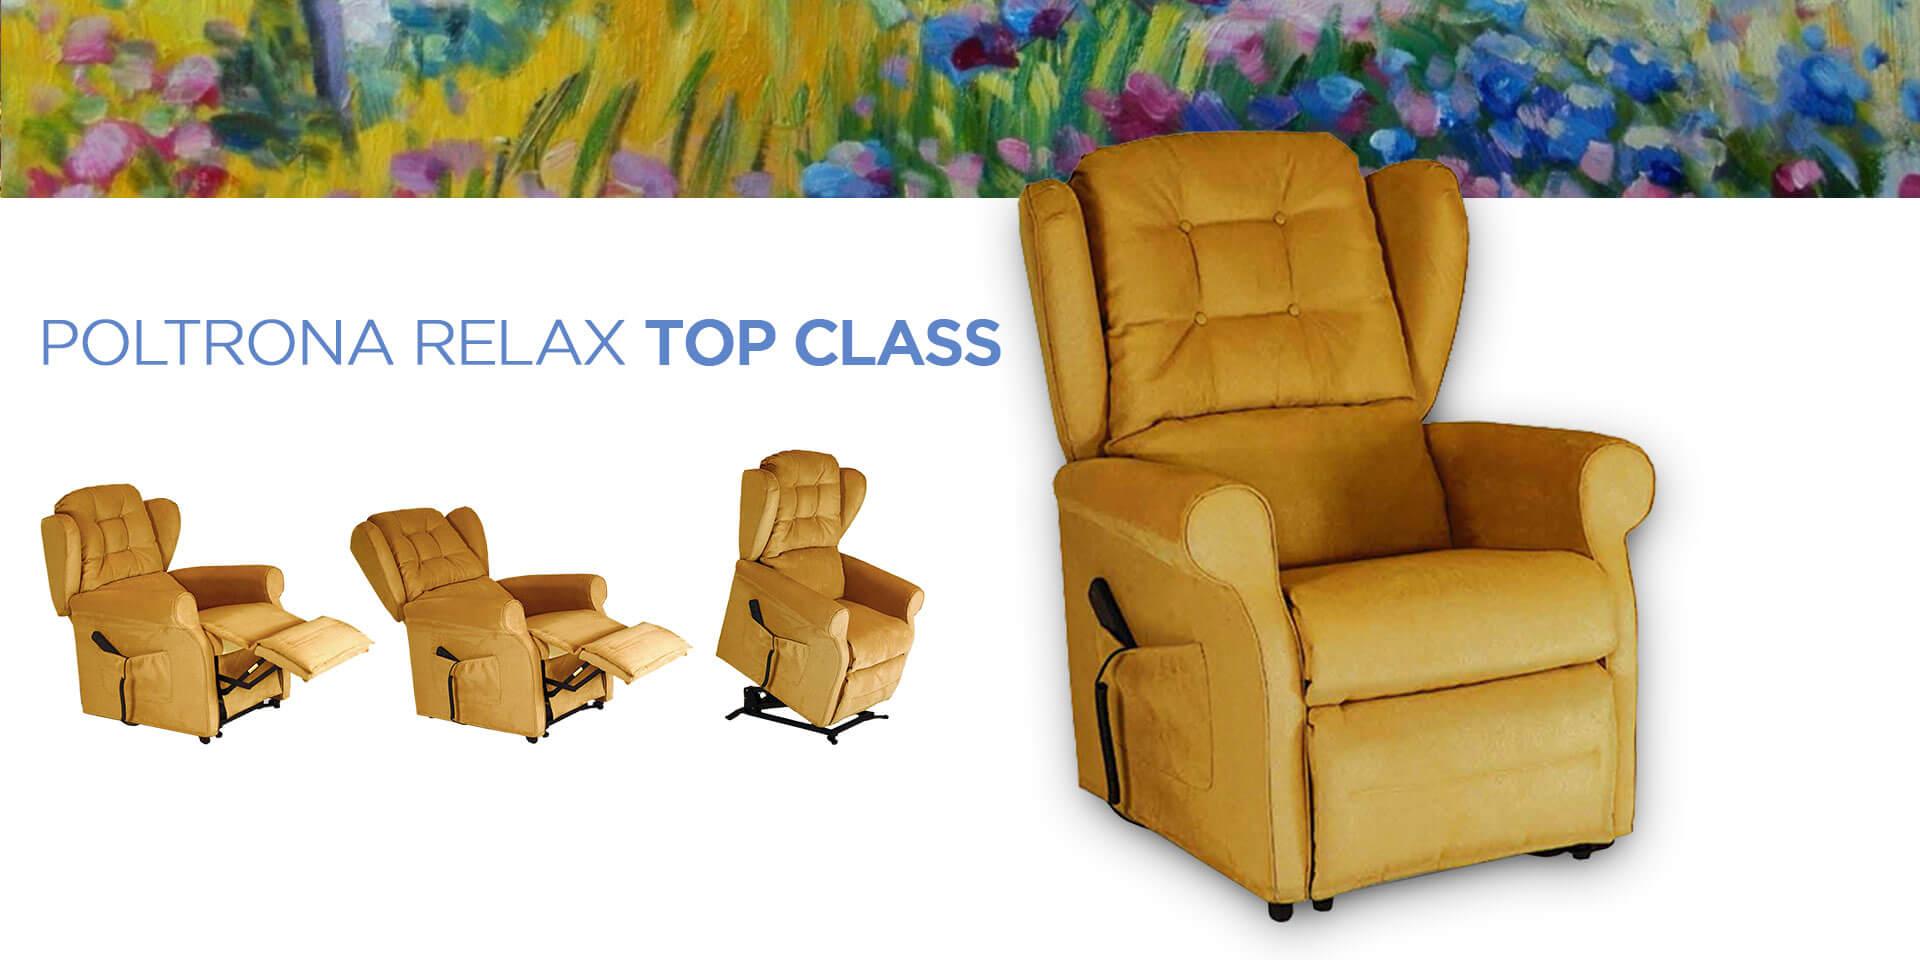 Poltrona reclinabile Top Class